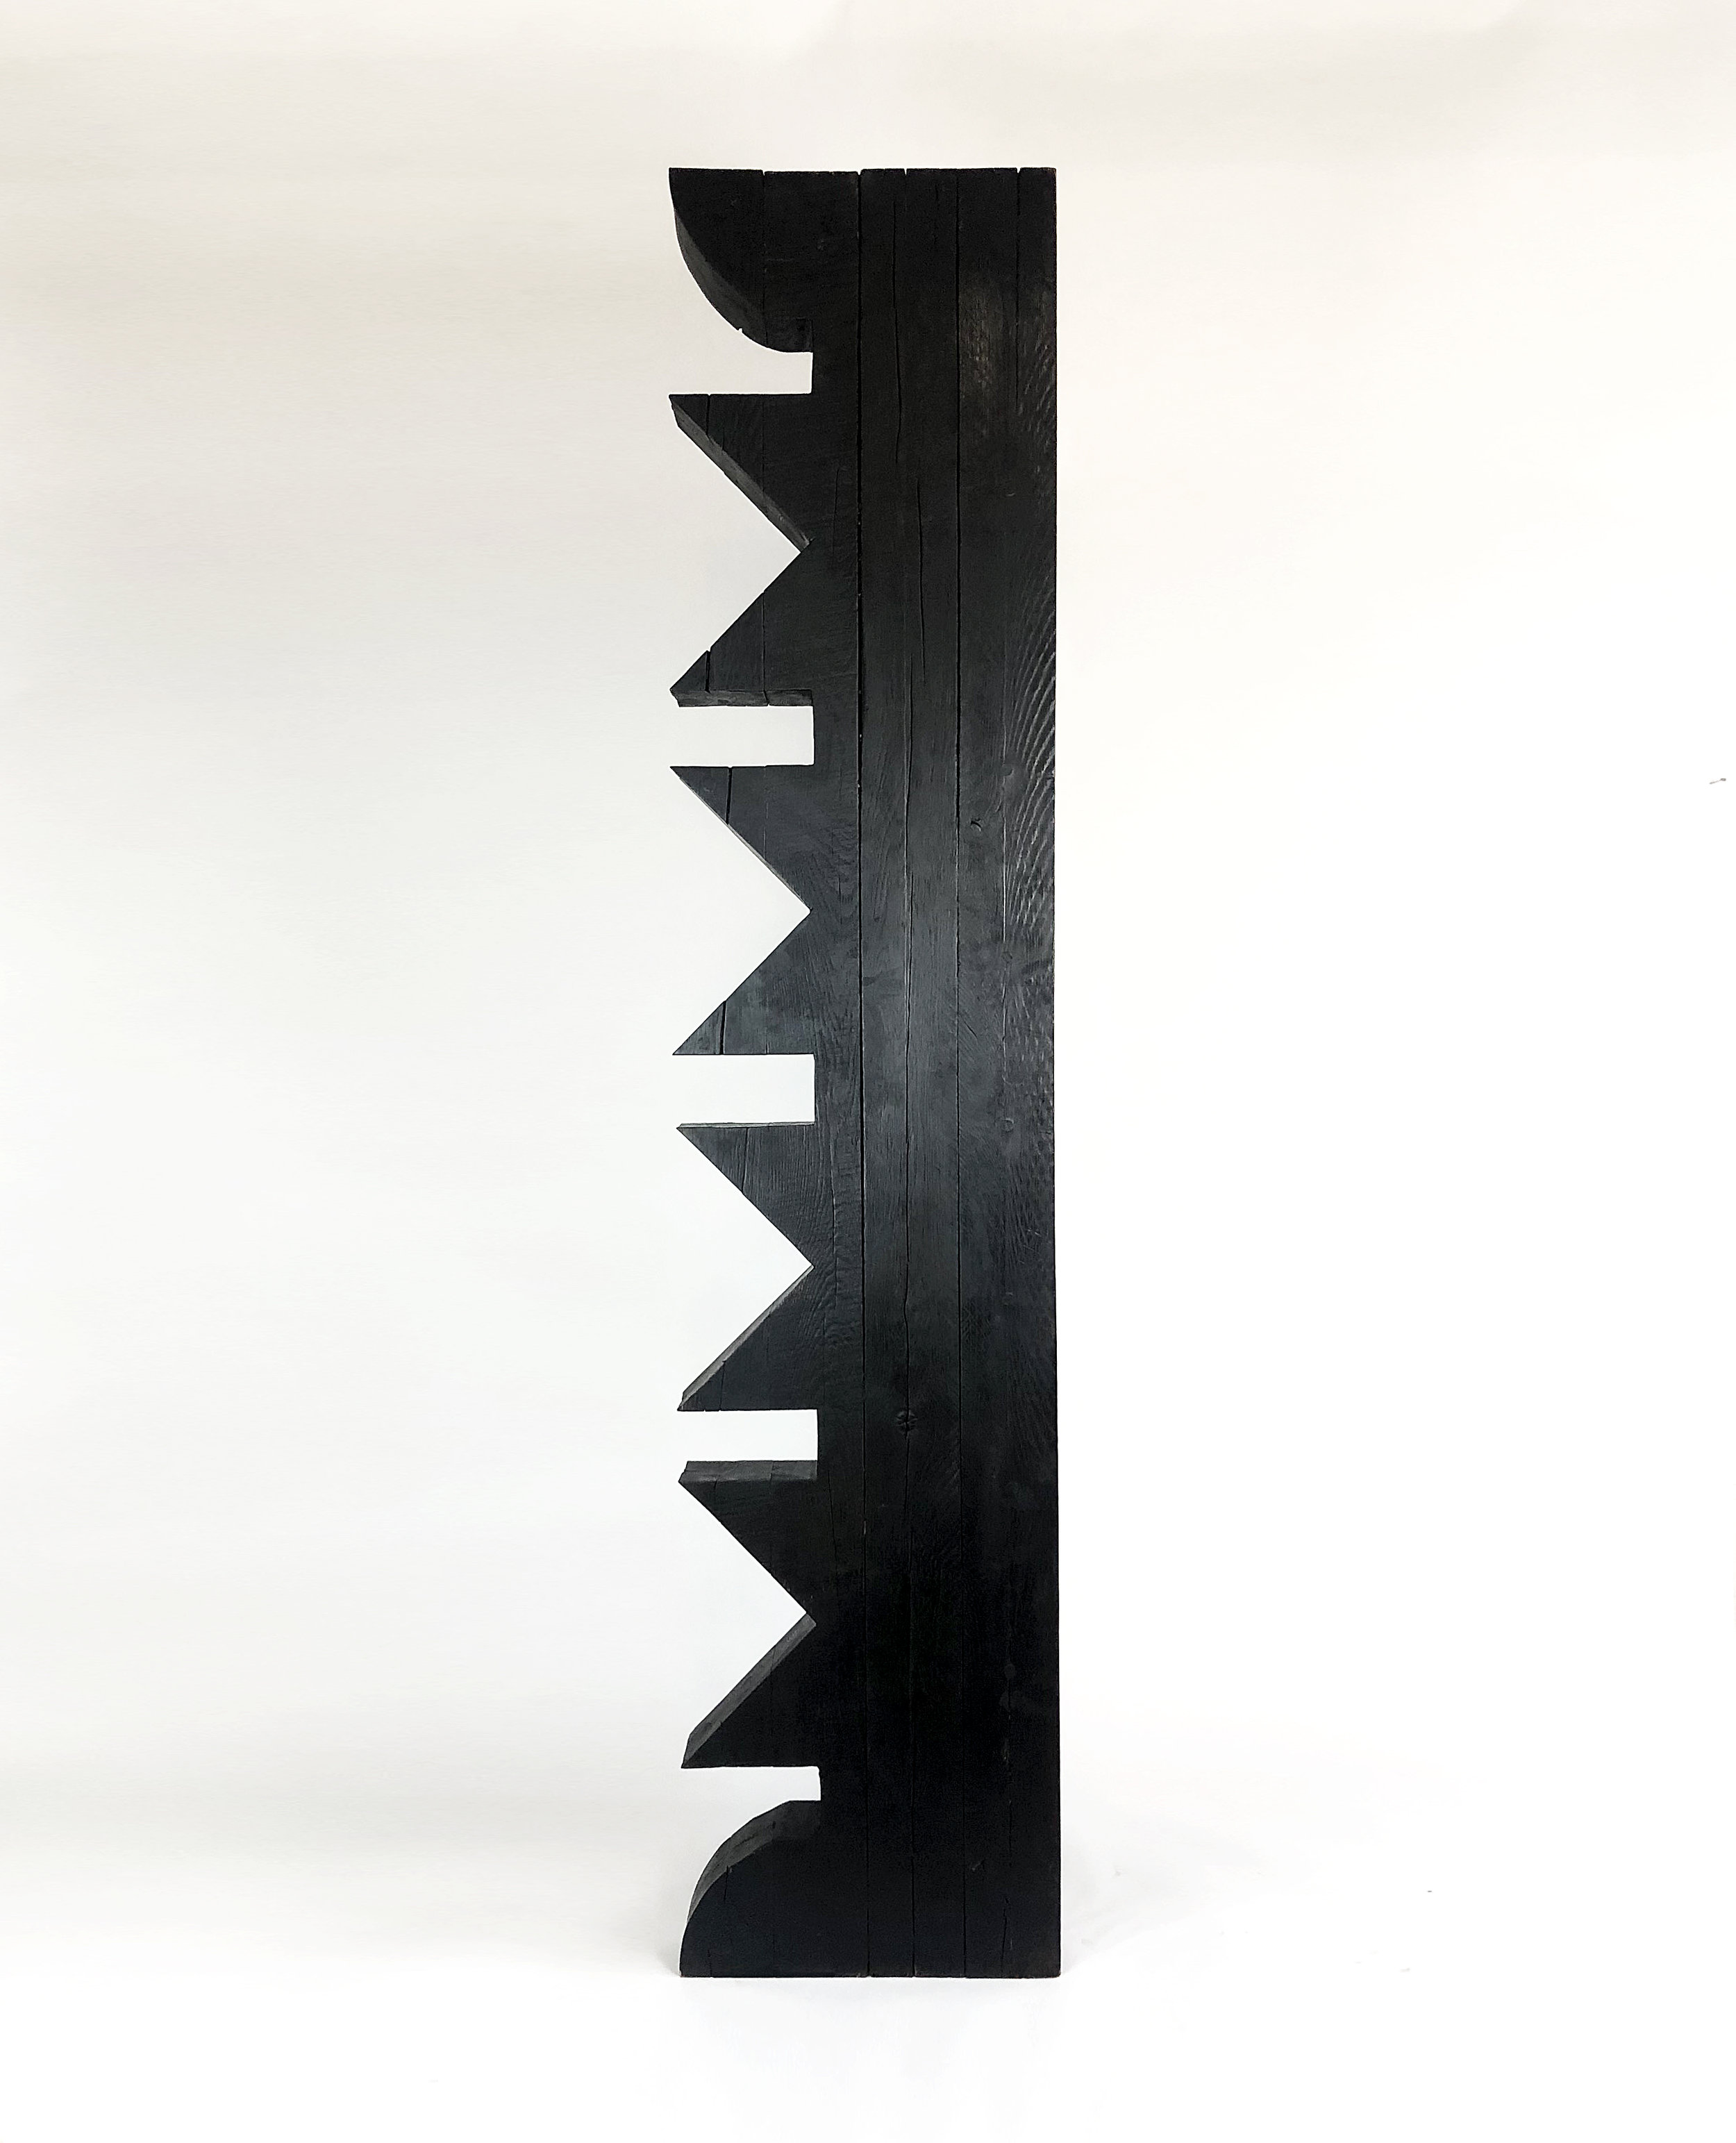 'Torr III', Burnt Oak finished with wax, 188x 40x40cm